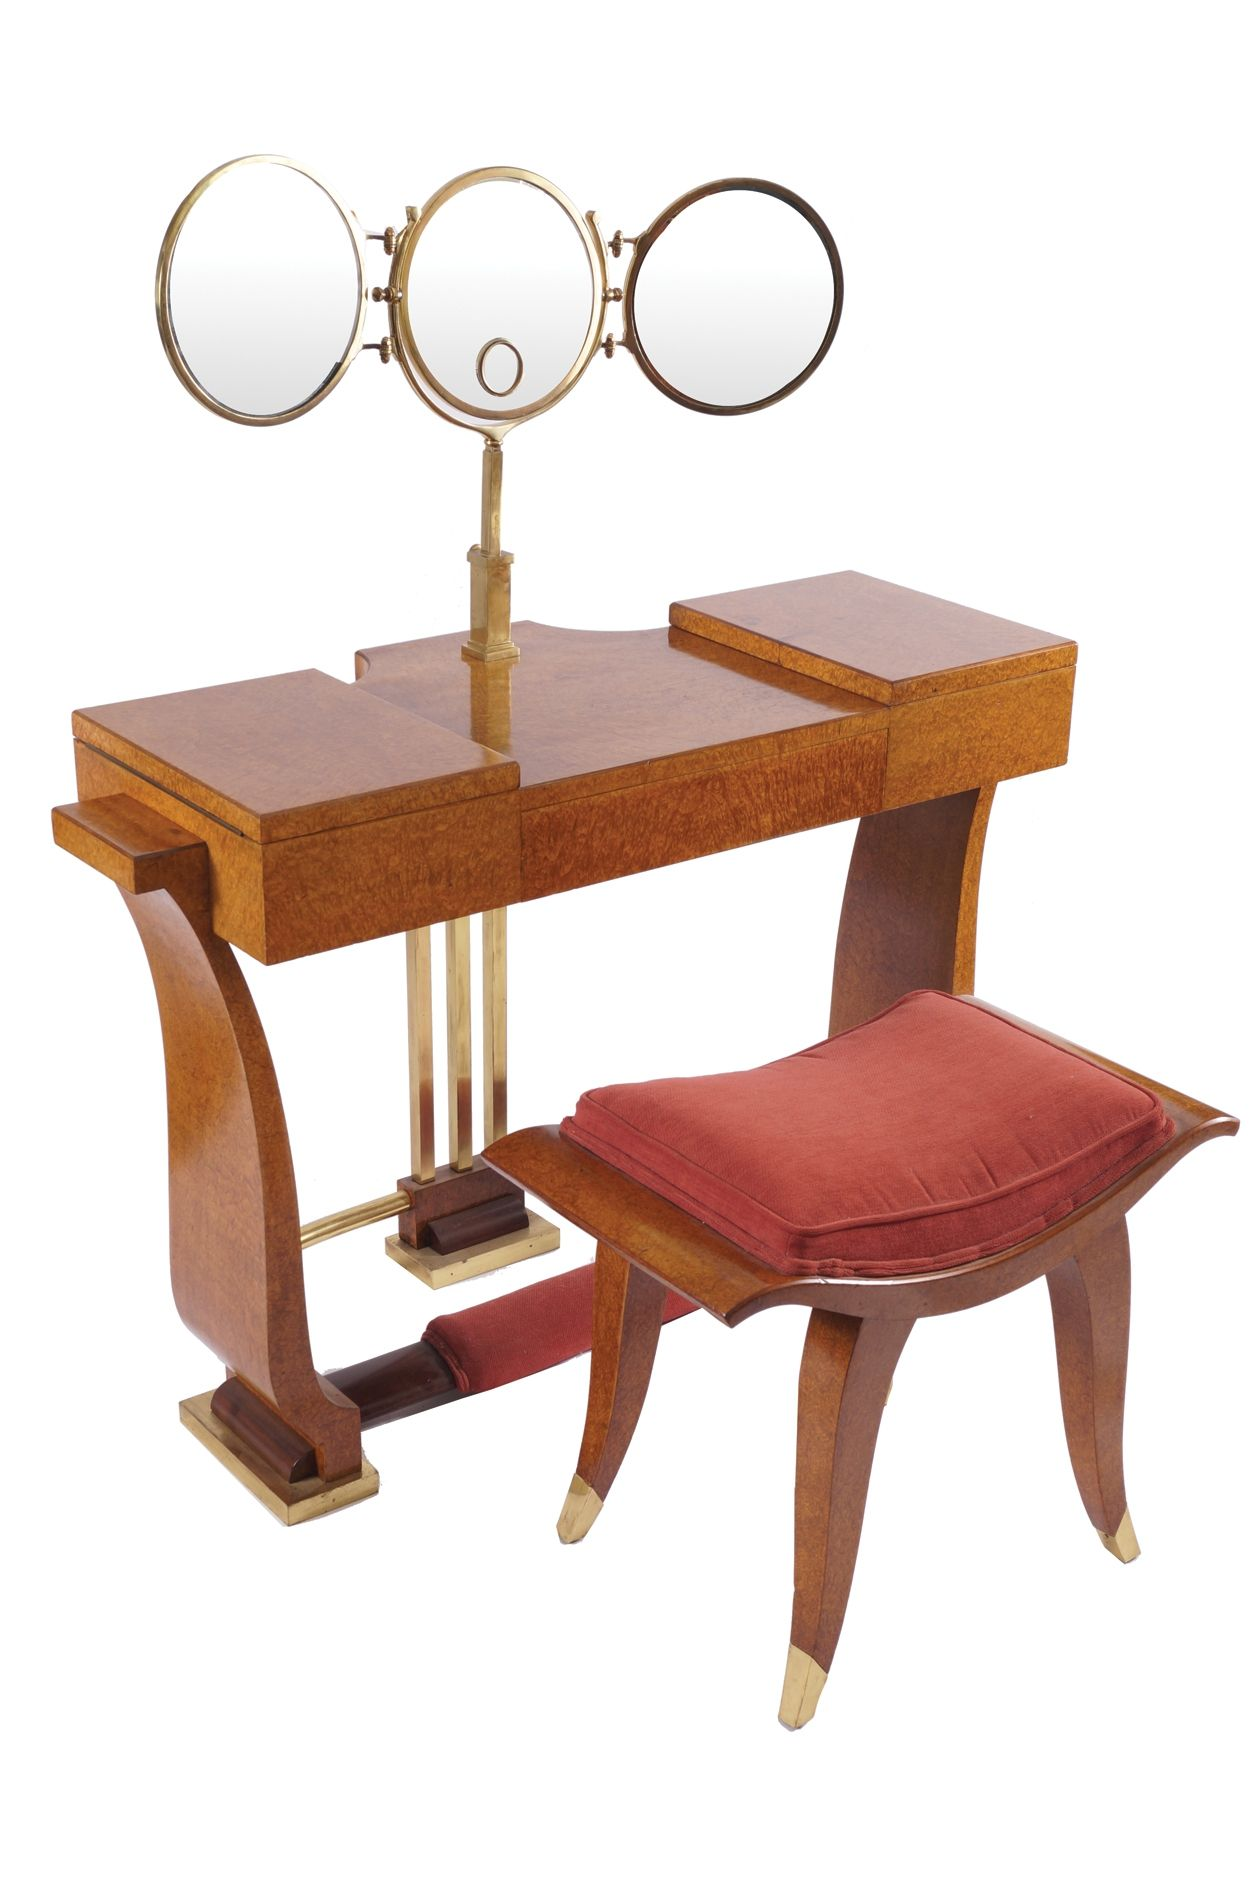 Jules Leleu (French, 18831961) Sheppard's Irish Auction